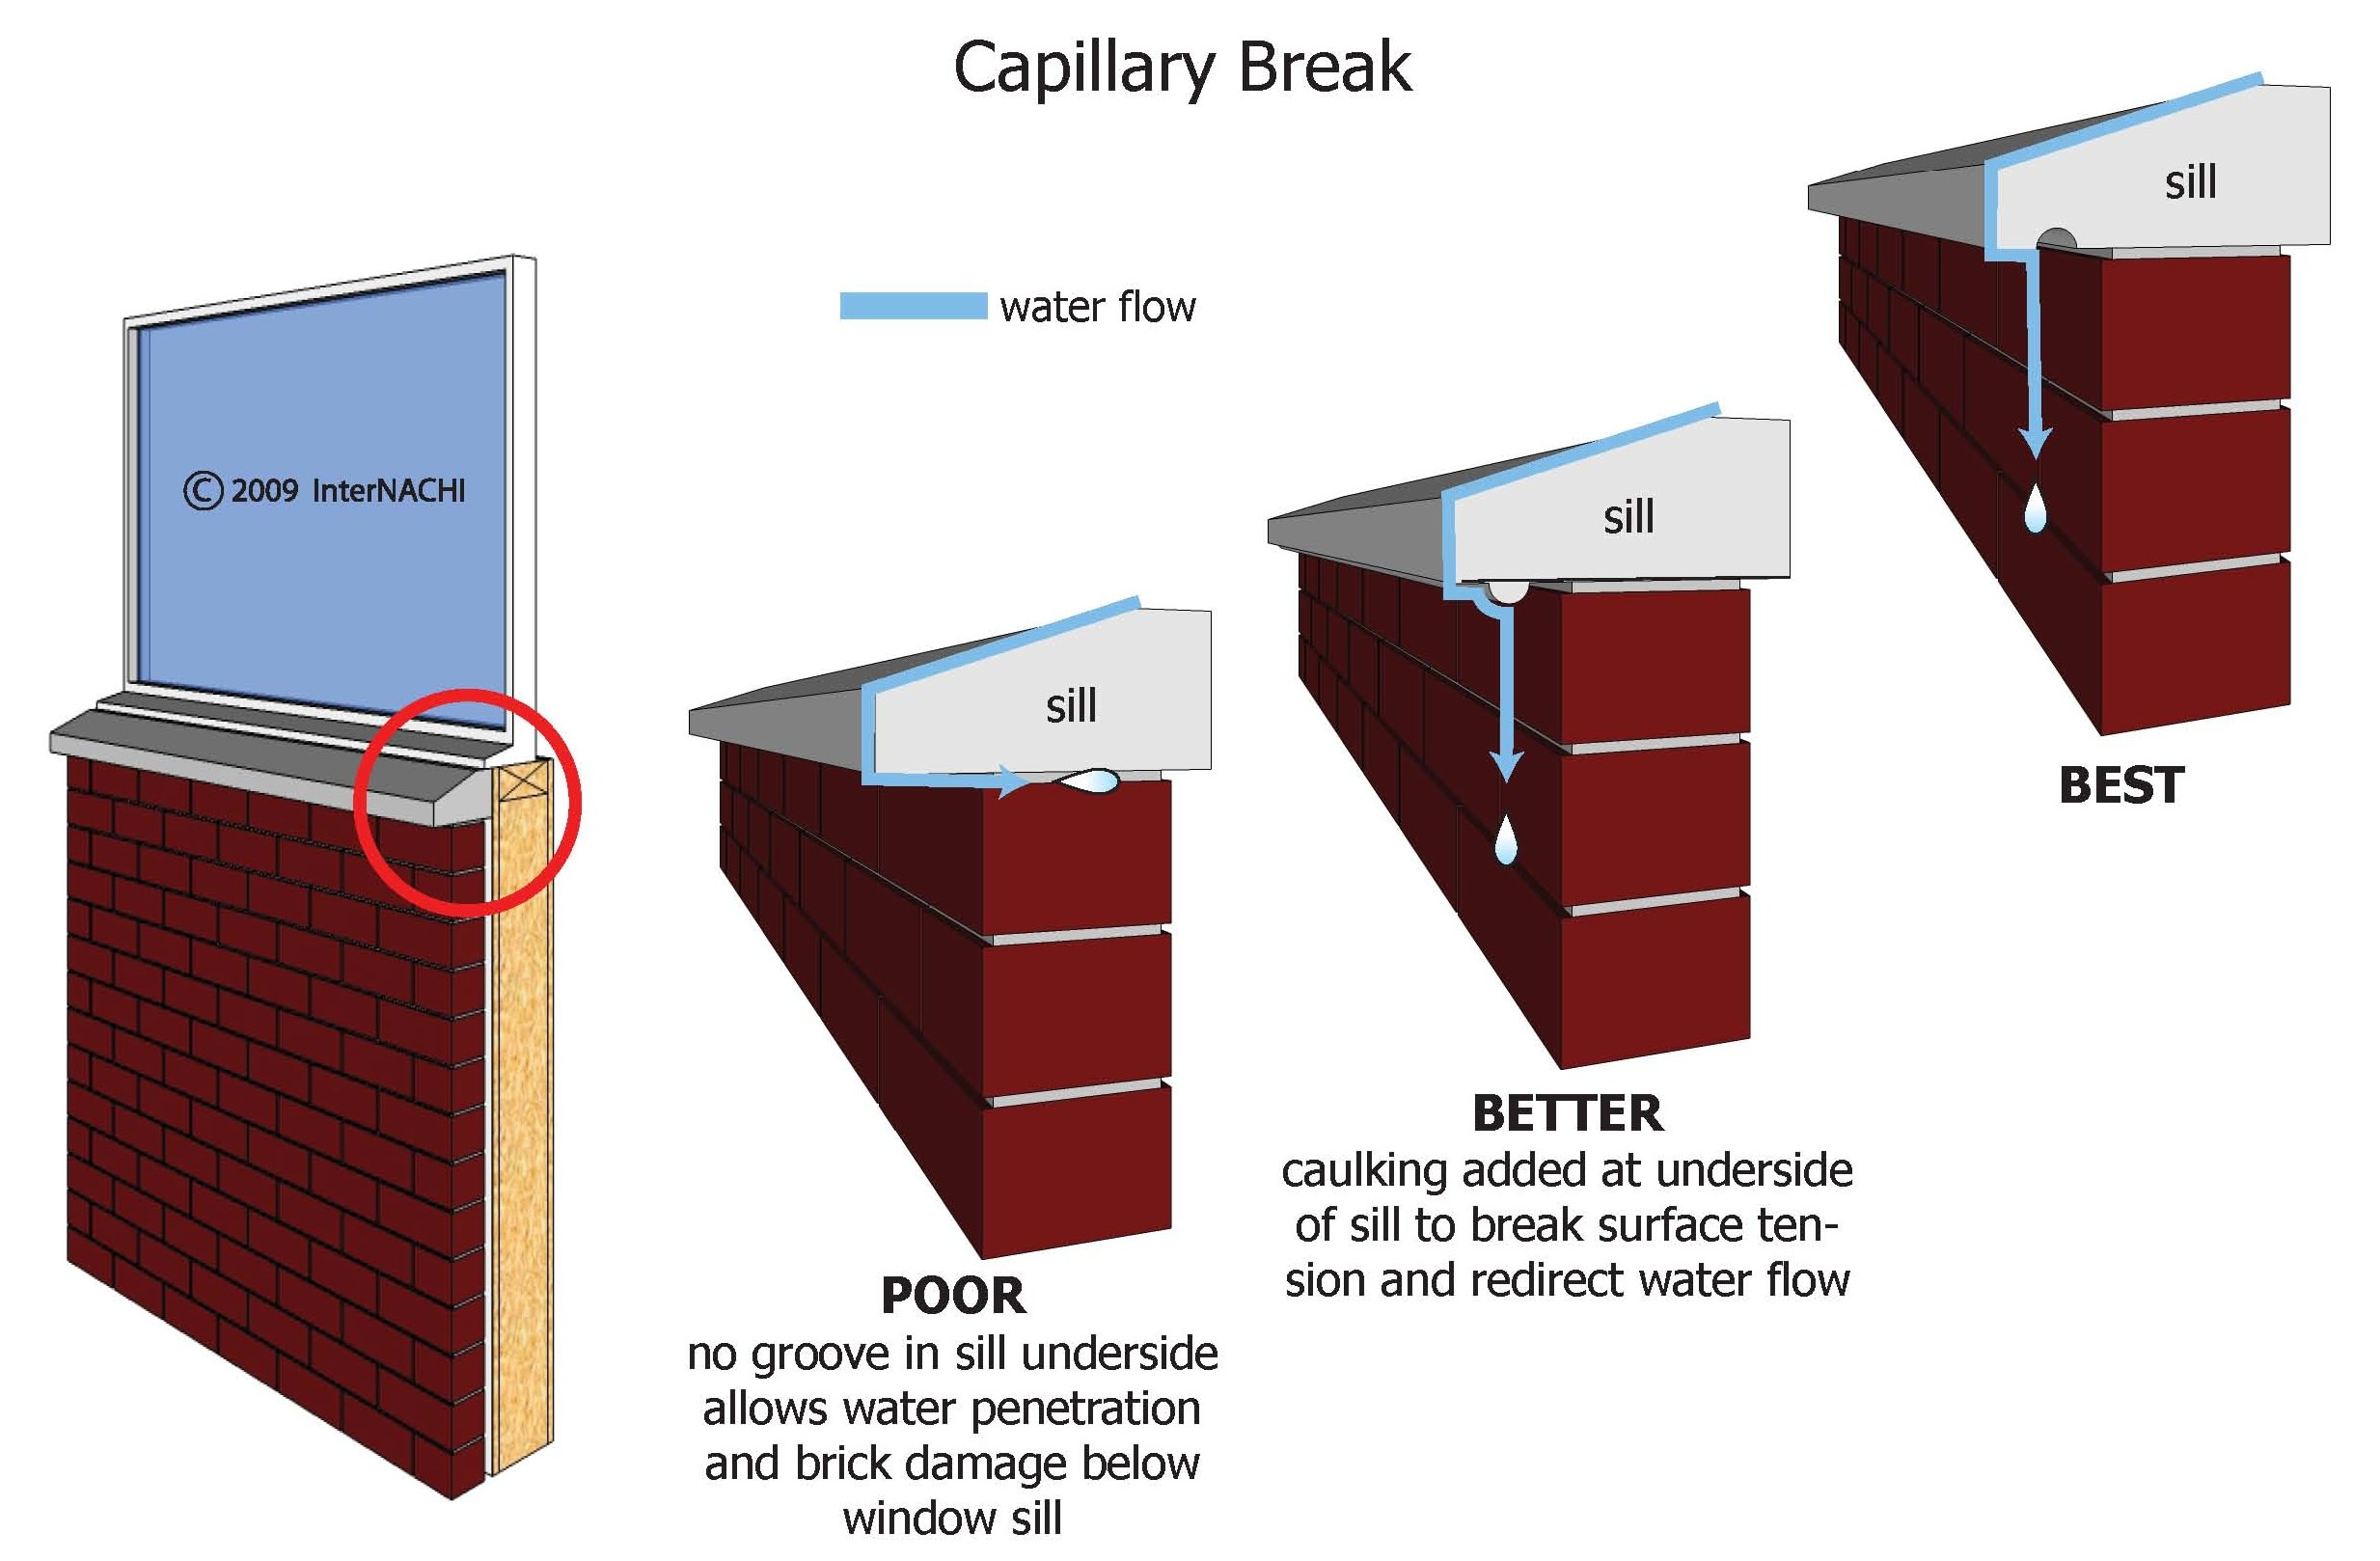 Capillary breaks.